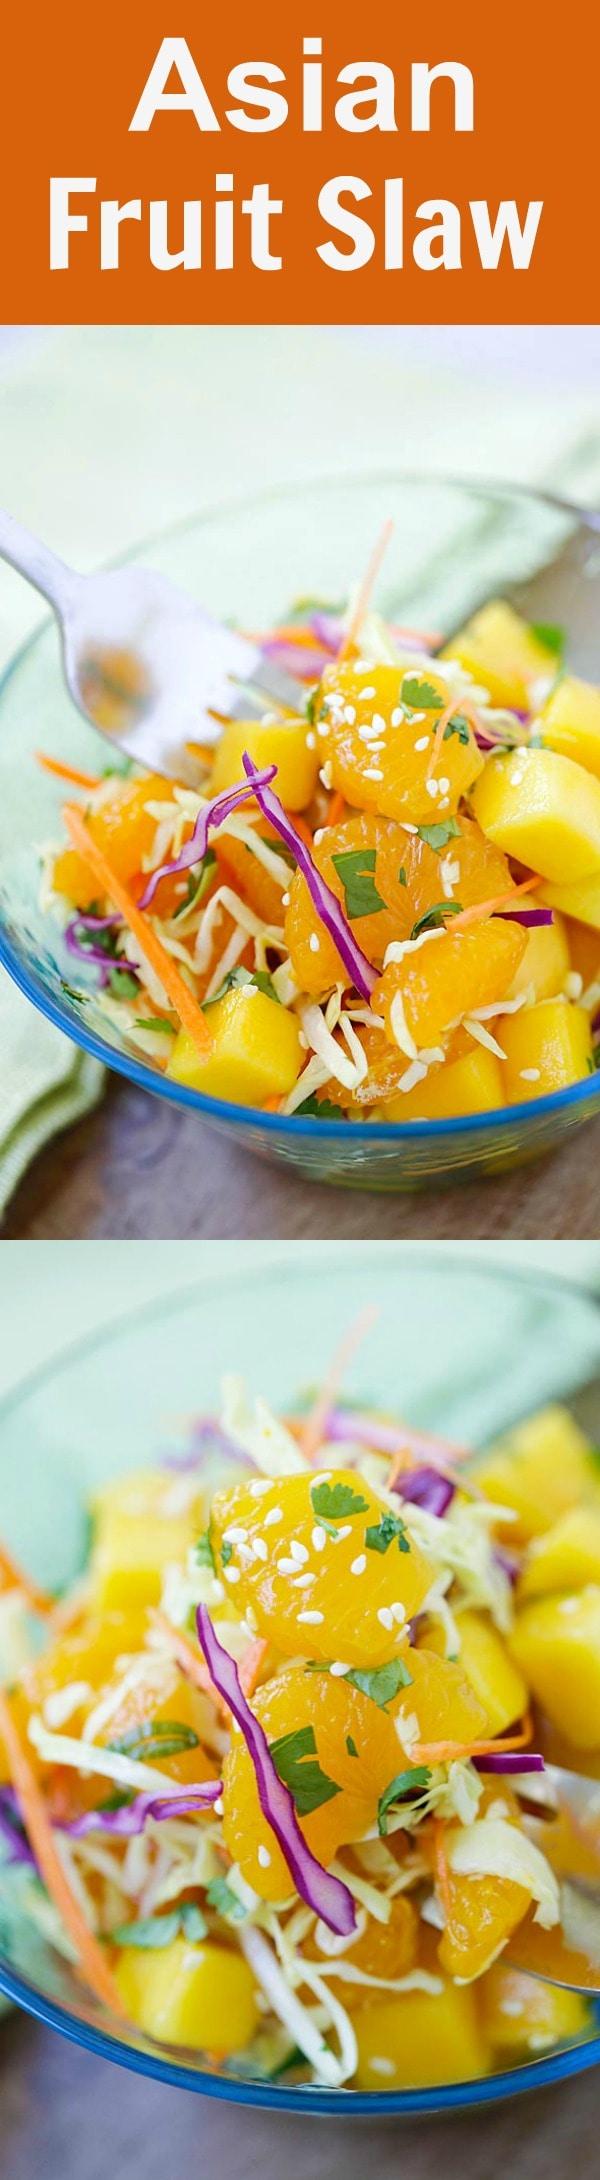 Asian Fruit Slaw Rasa Malaysia